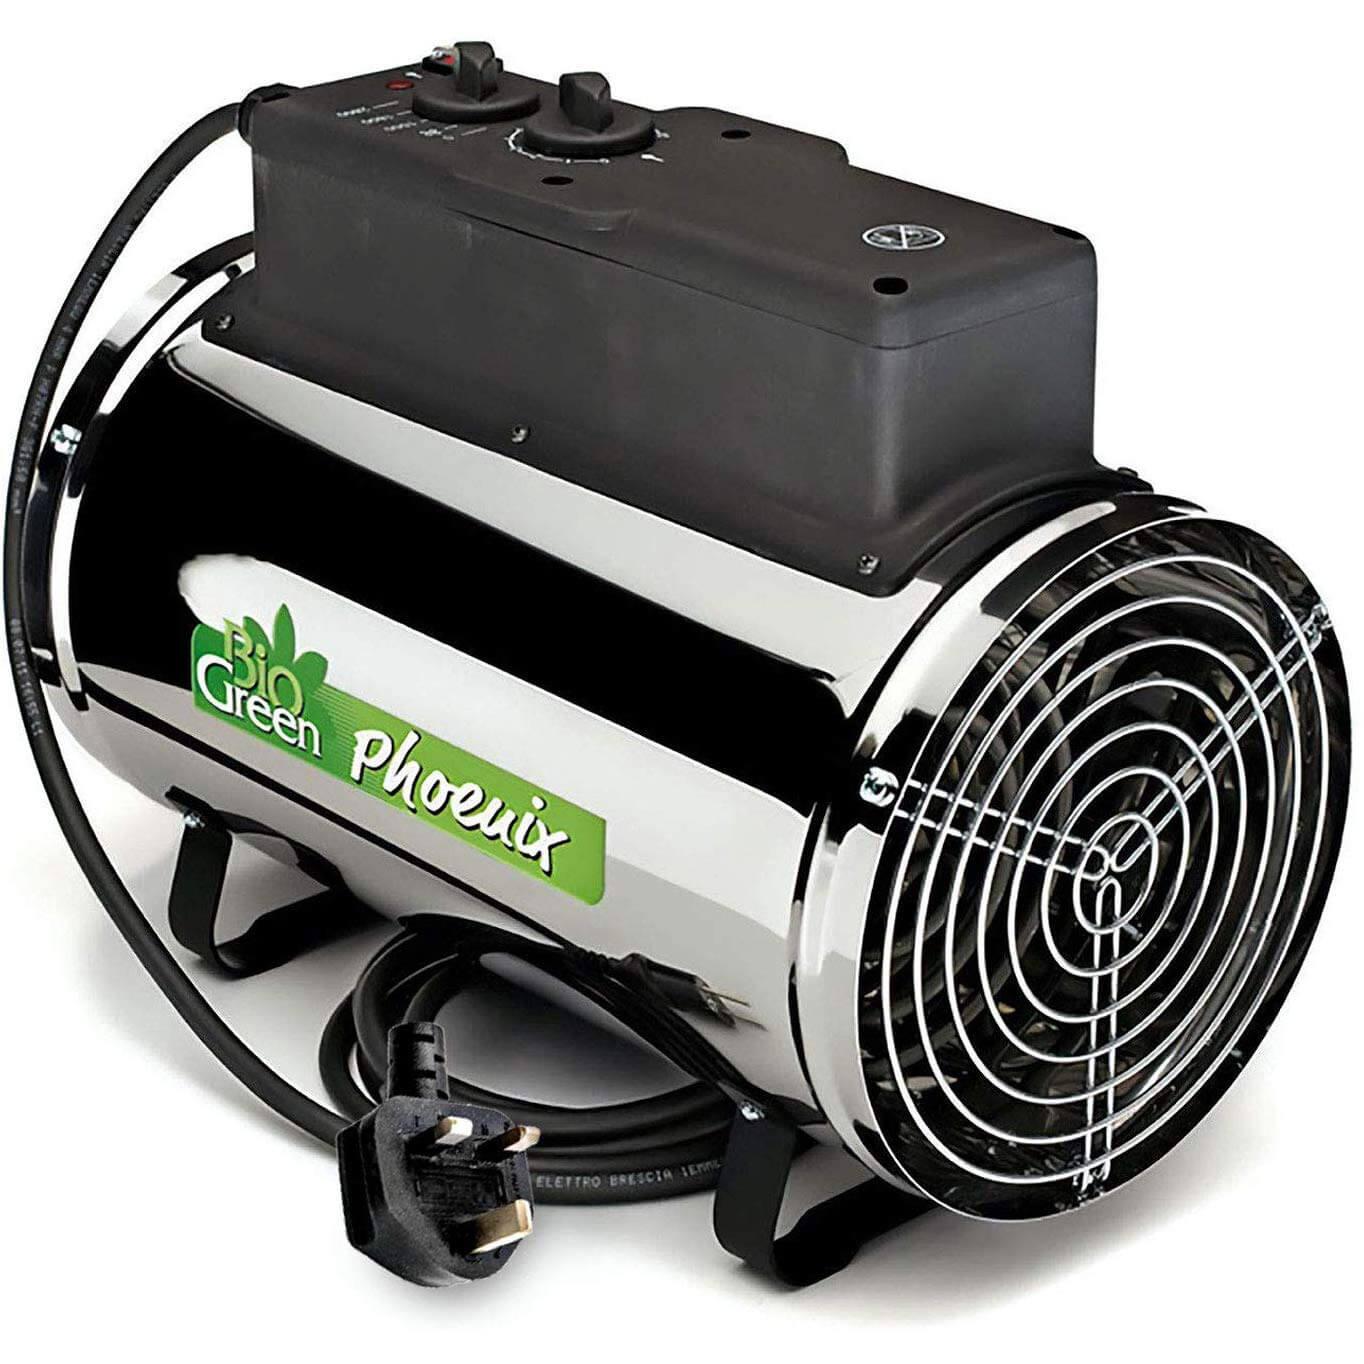 Biogreen PHX 2.8/GB Phoenix Electric Fan Heater